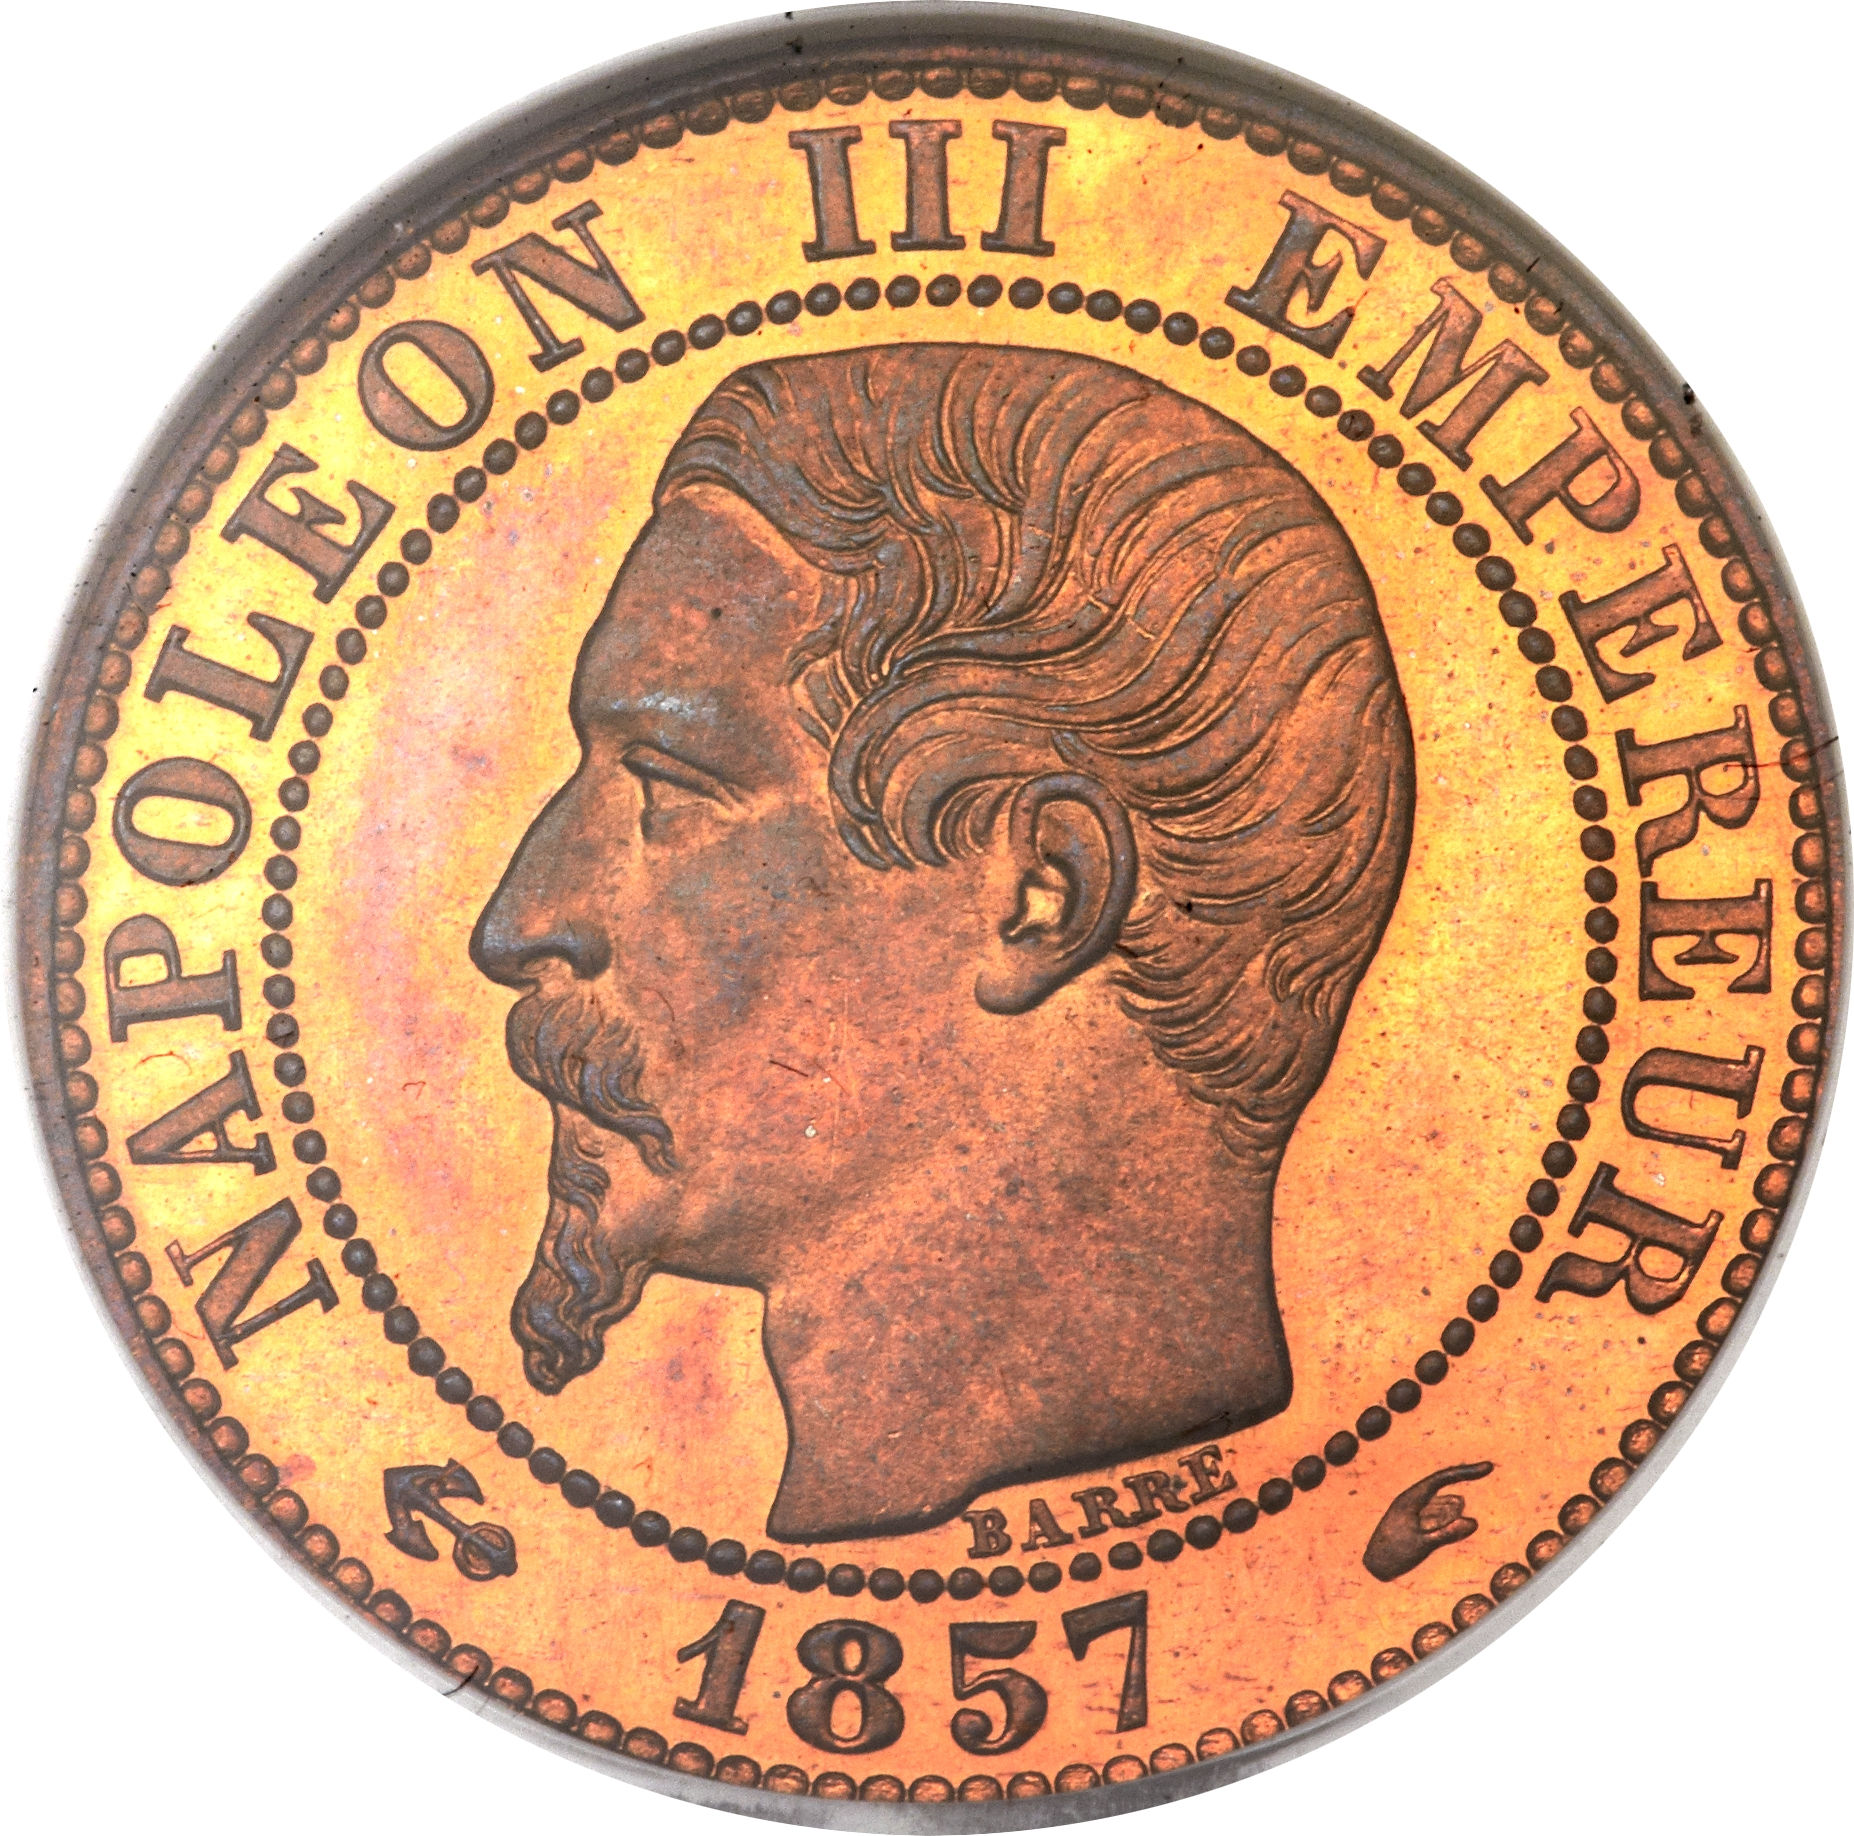 Centimes - Napoleon III - France – Numista